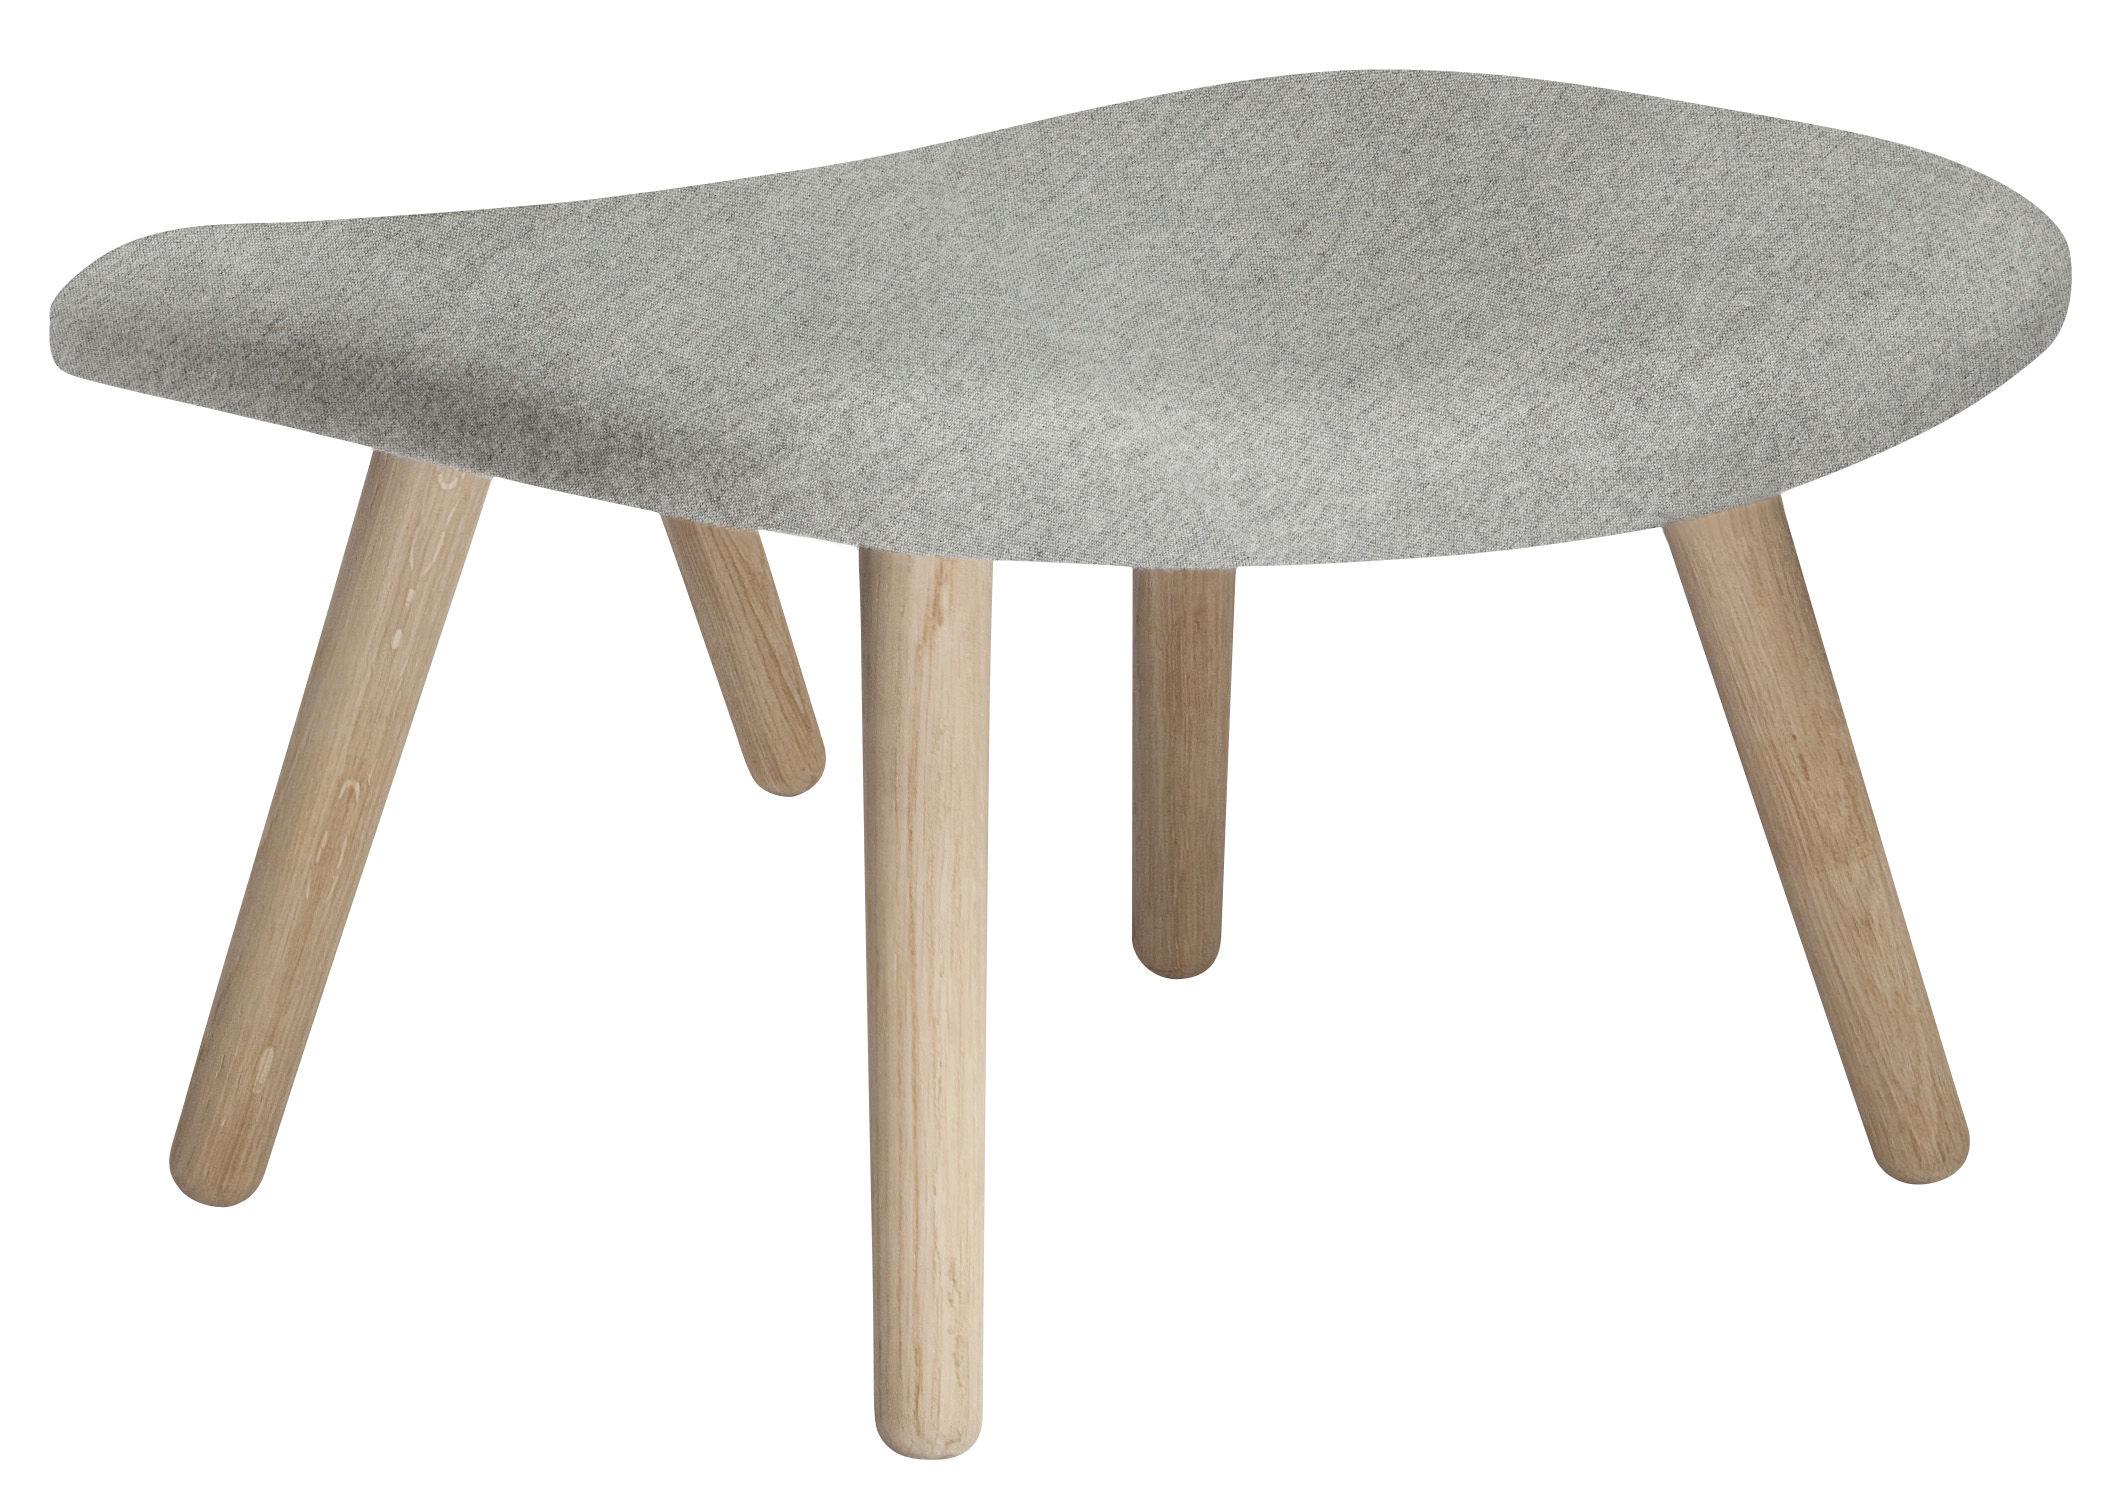 pouf about a lounge tissu hallingdal tissu gris clair pieds bois naturel hay. Black Bedroom Furniture Sets. Home Design Ideas